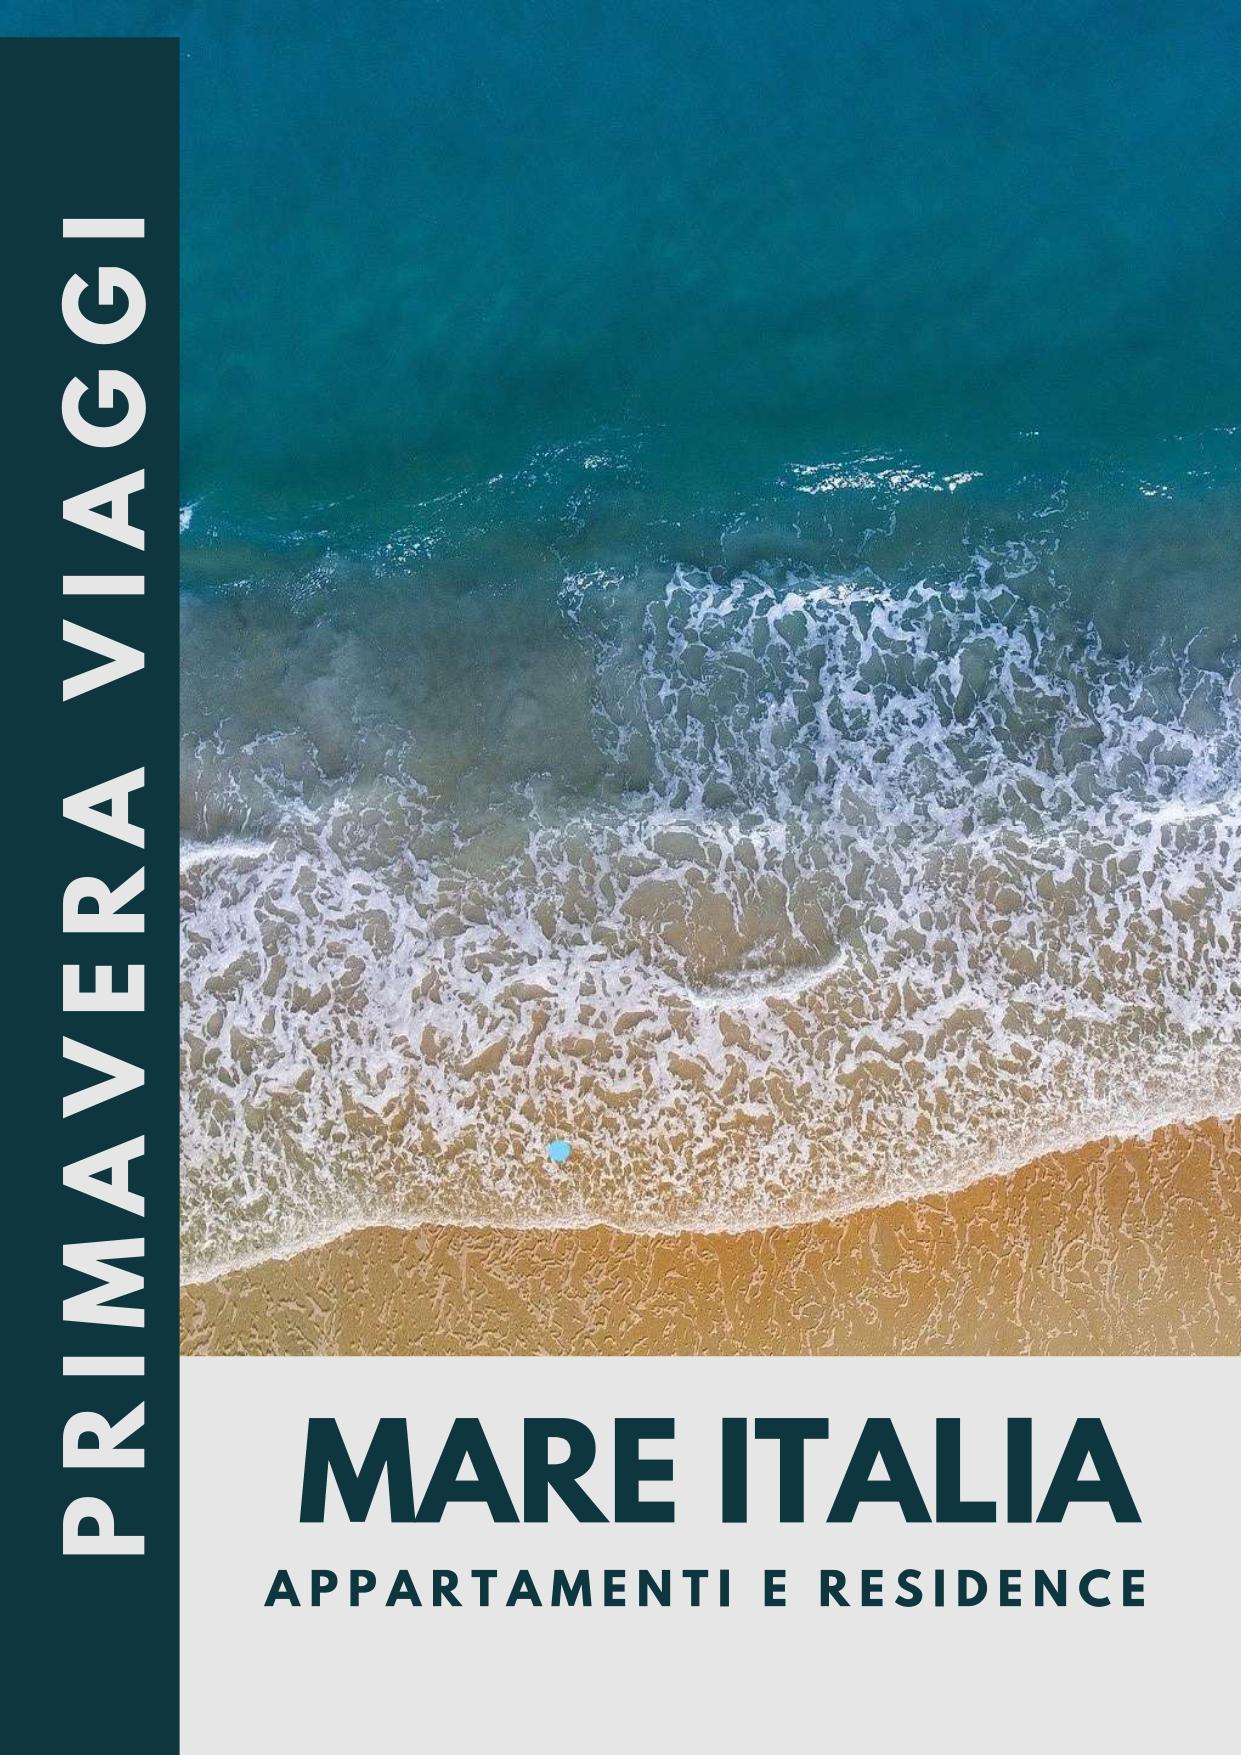 MARE ITALIA